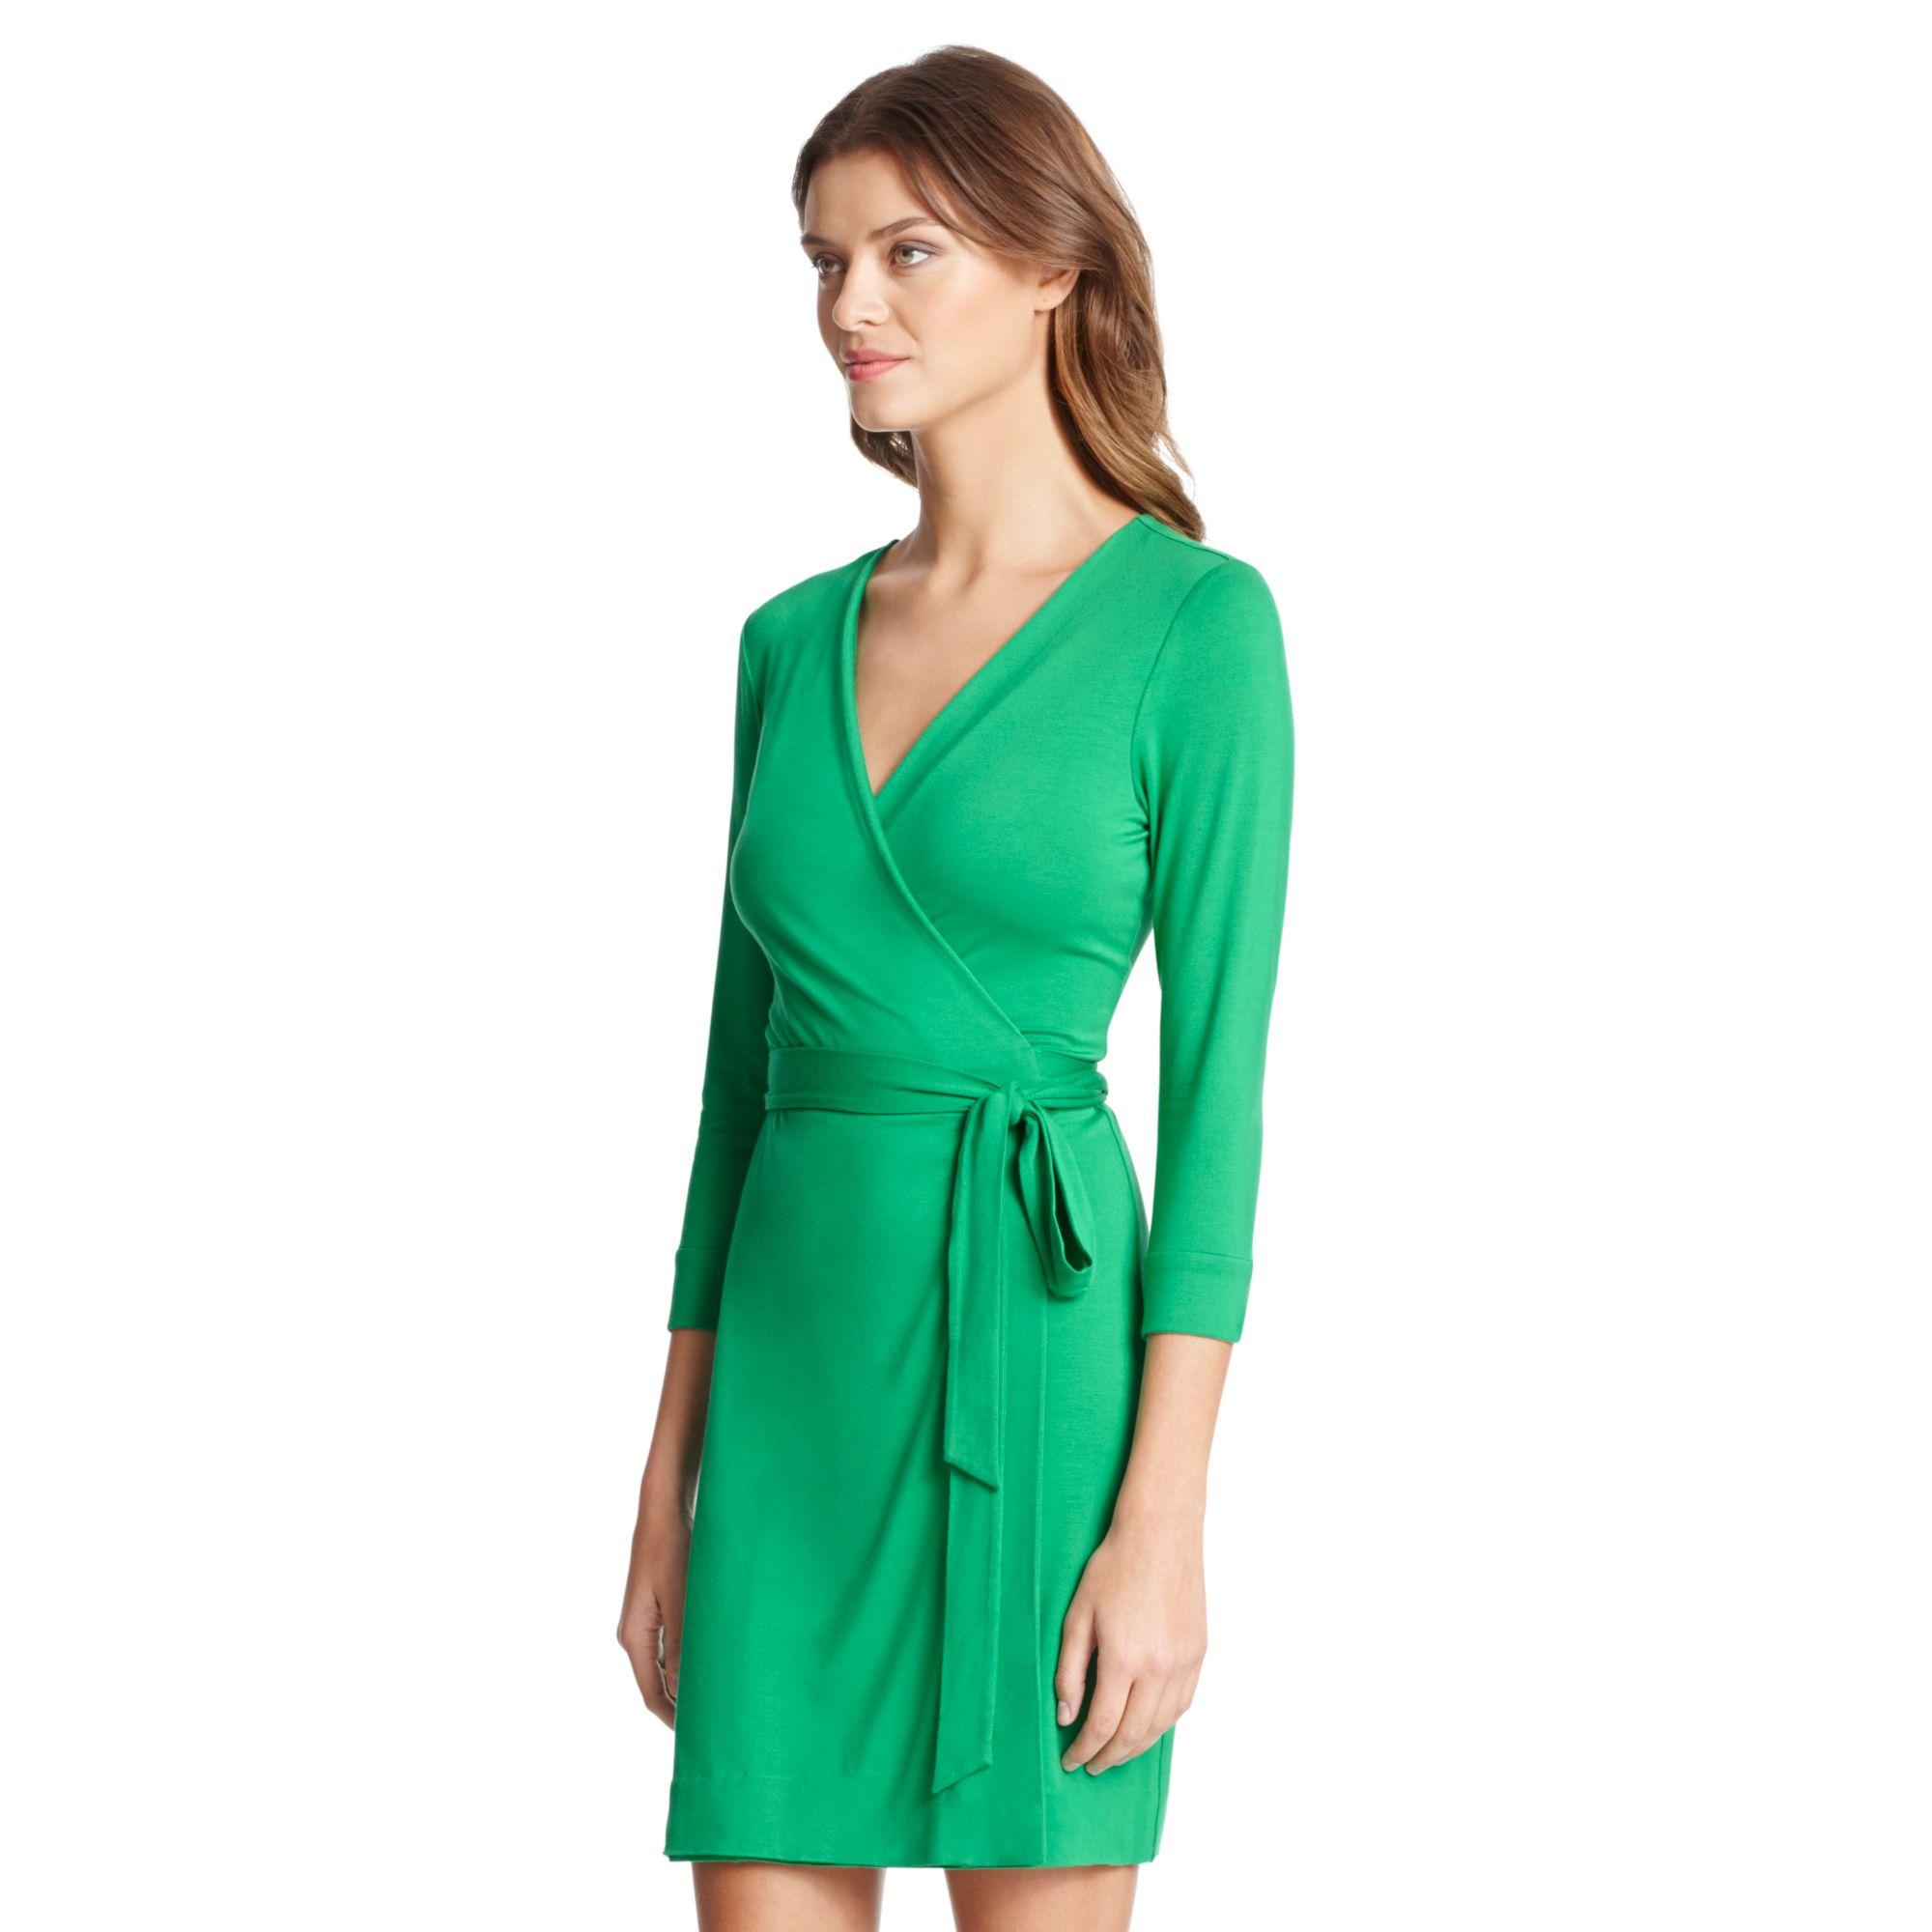 Diane von furstenberg New Julian Two Mini Jersey Wrap Dress in ...